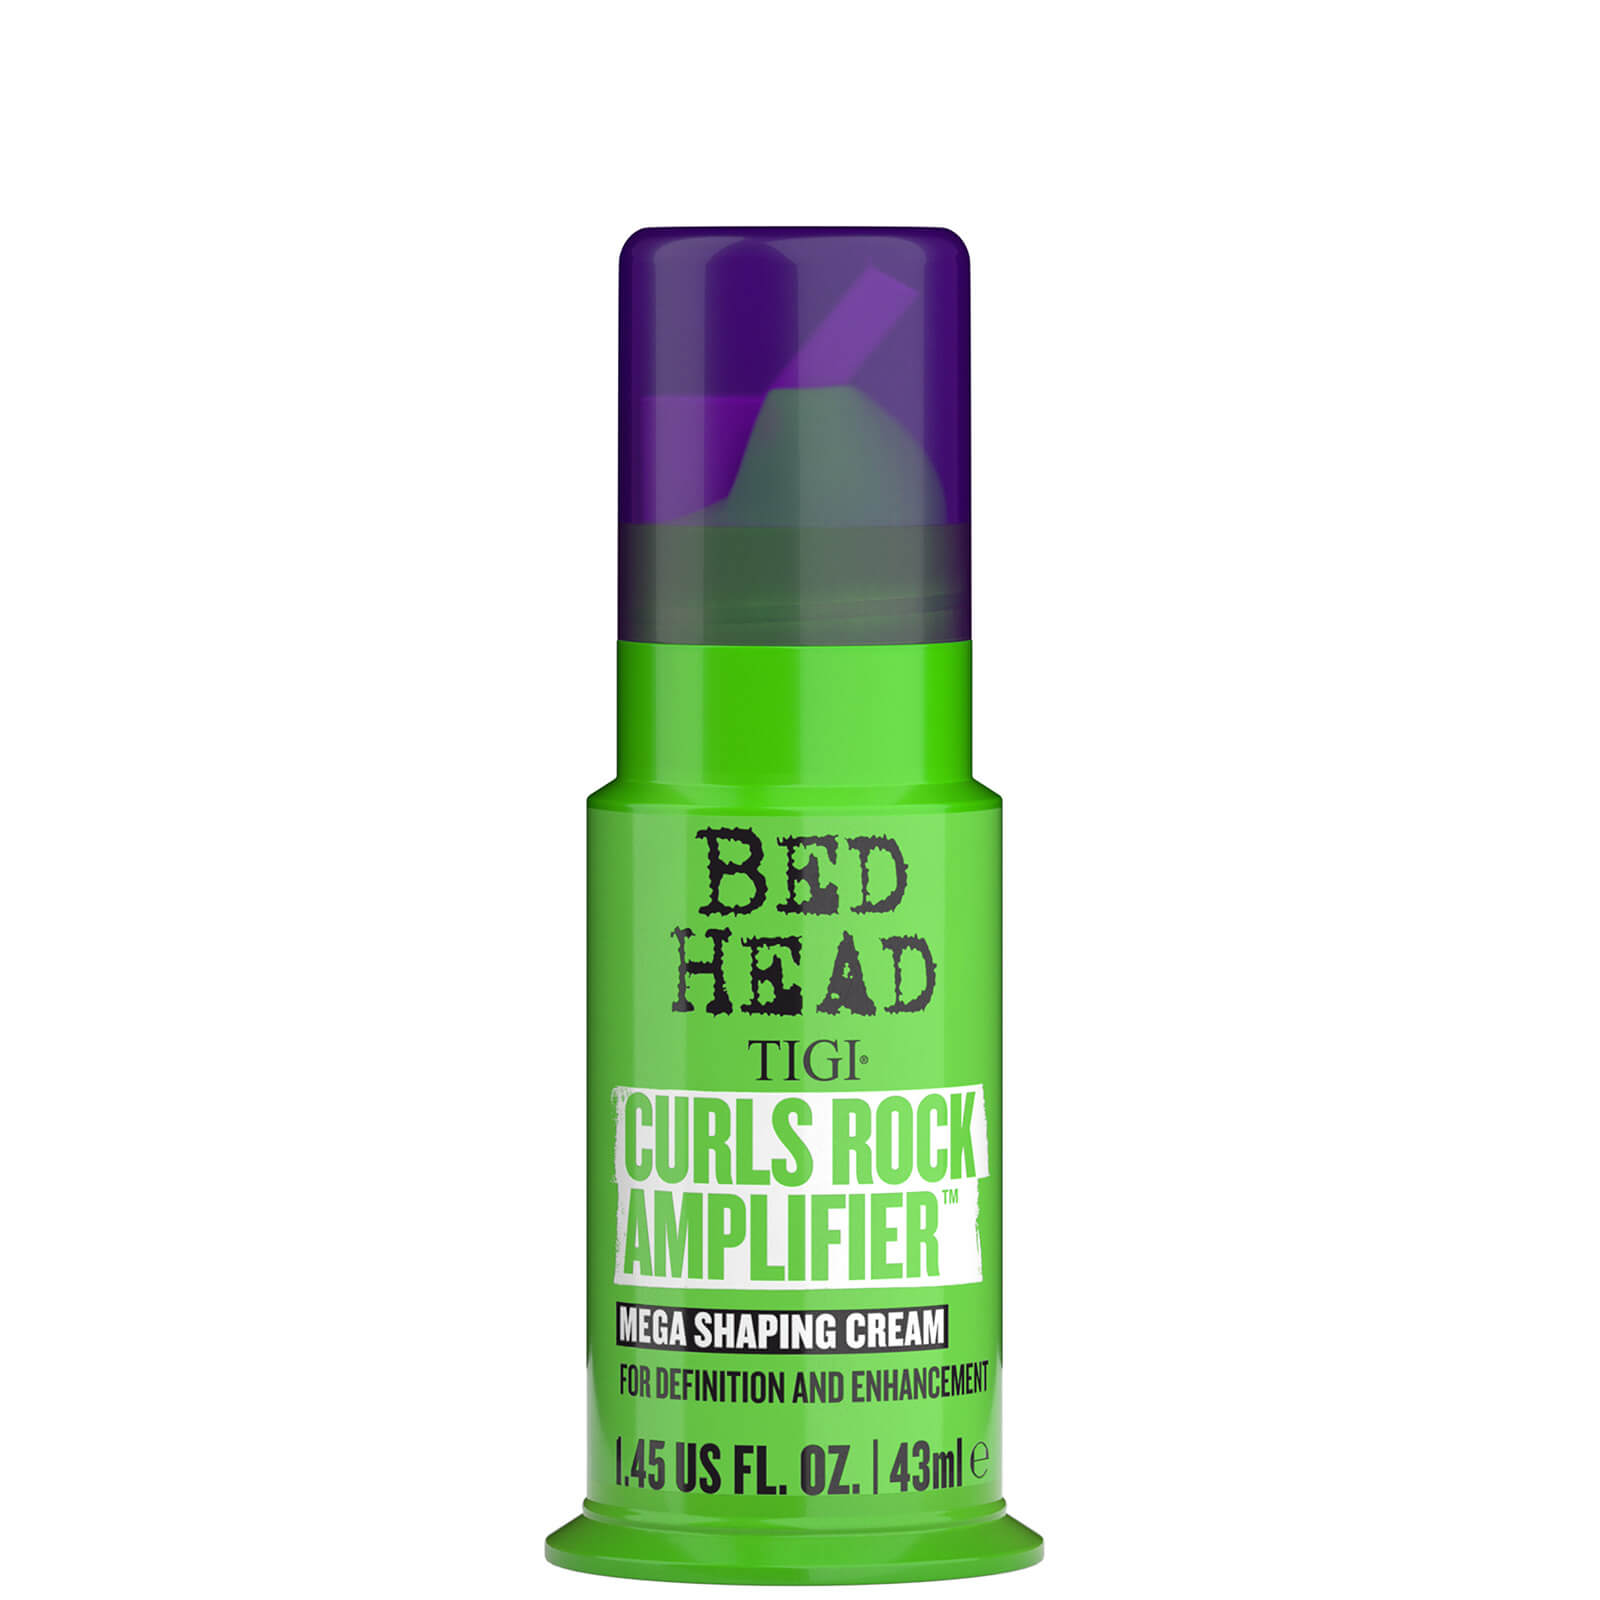 Купить TIGI Bed Head Curls Rock Amplifier Curly Hair Cream Travel Size 43ml